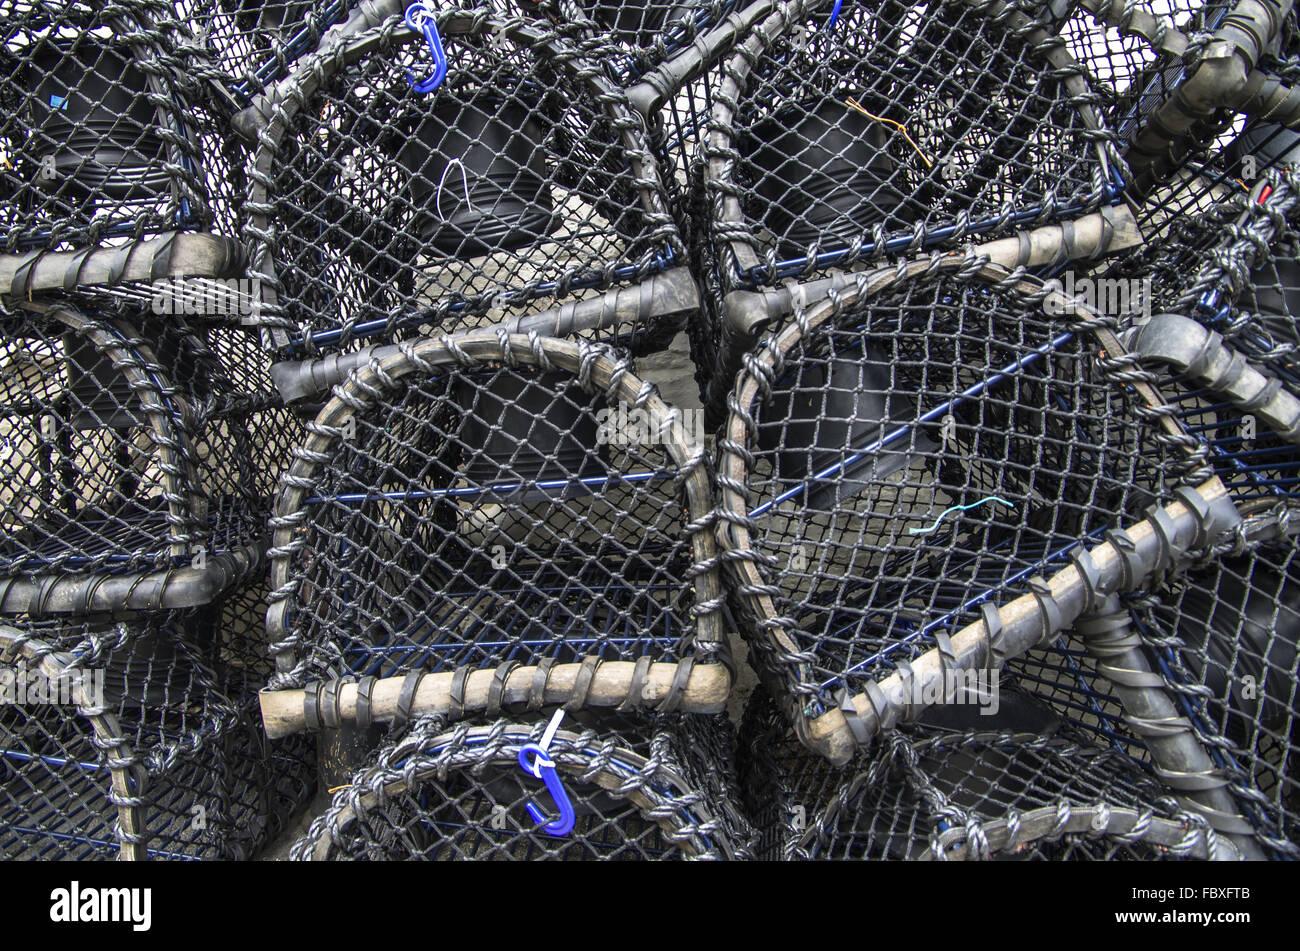 Lobster bakets - Stock Image